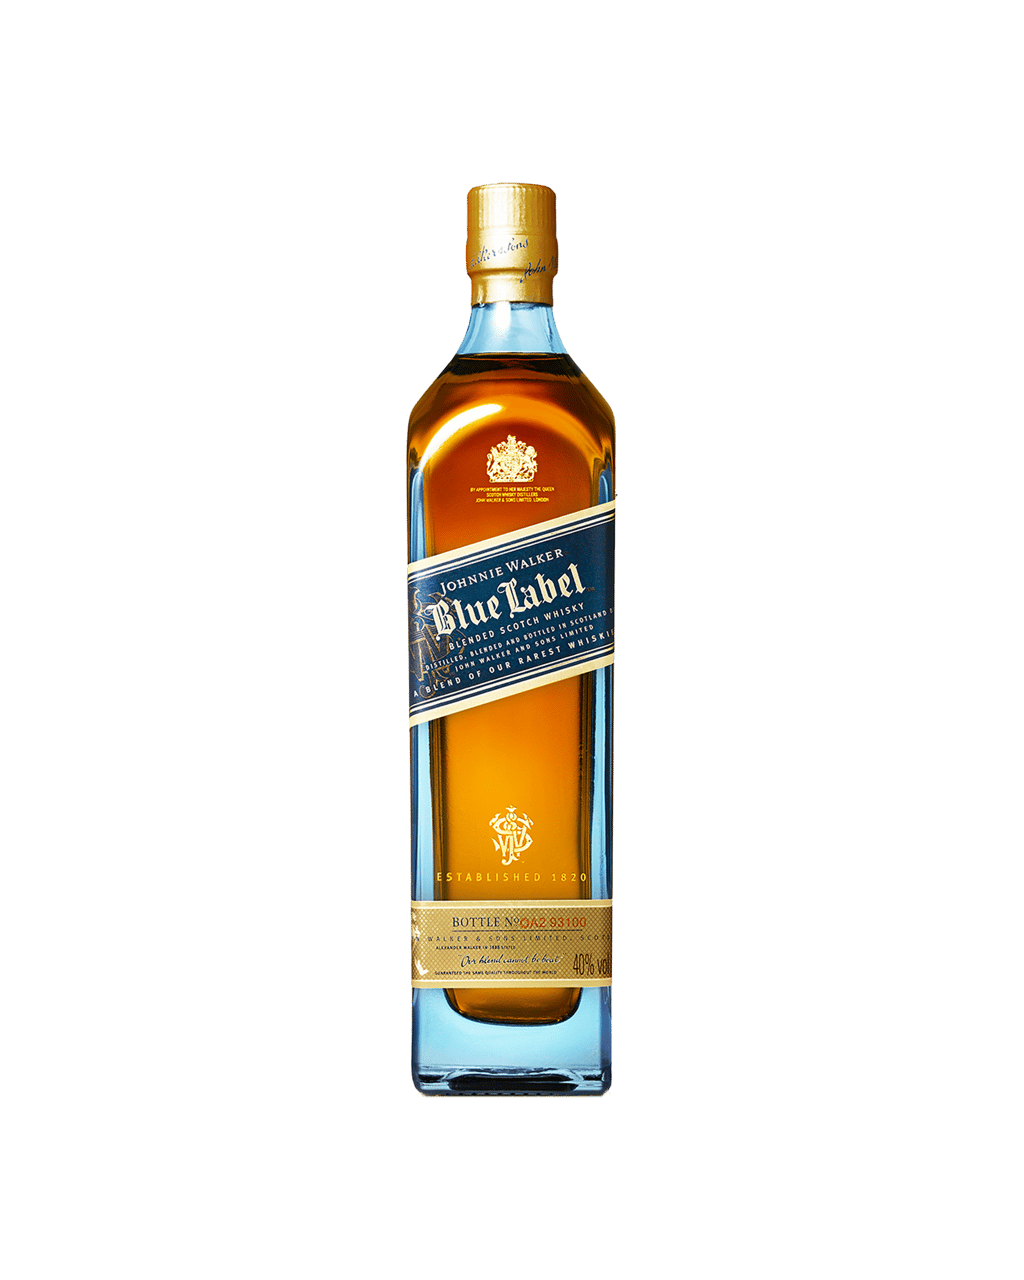 Sparkling Drinks Alcoholic: Buy Johnnie Walker Blue Label Scotch Whisky 200mL